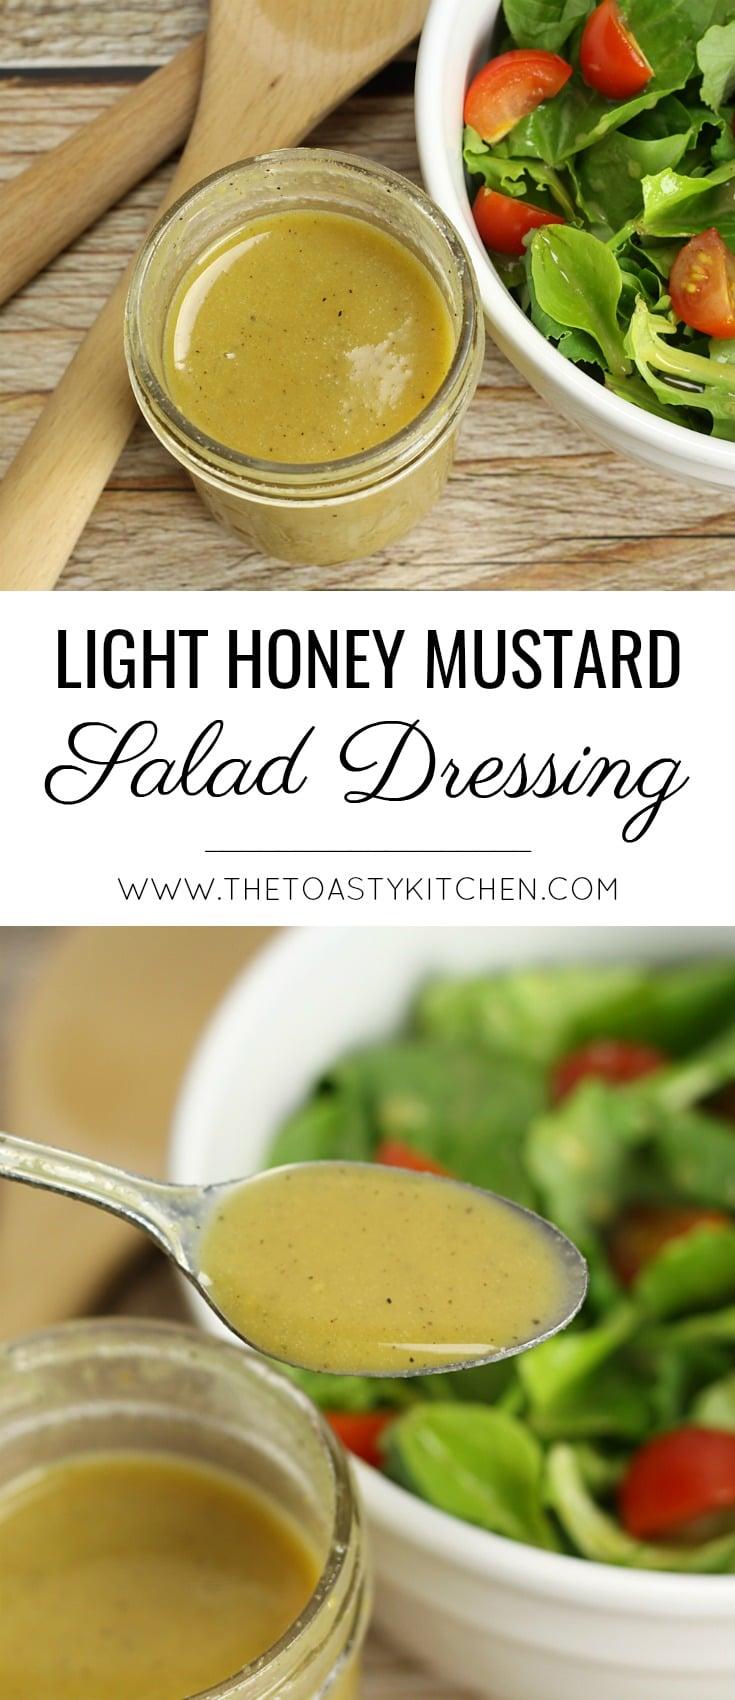 Light Honey Mustard Salad Dressing by The Toasty Kitchen